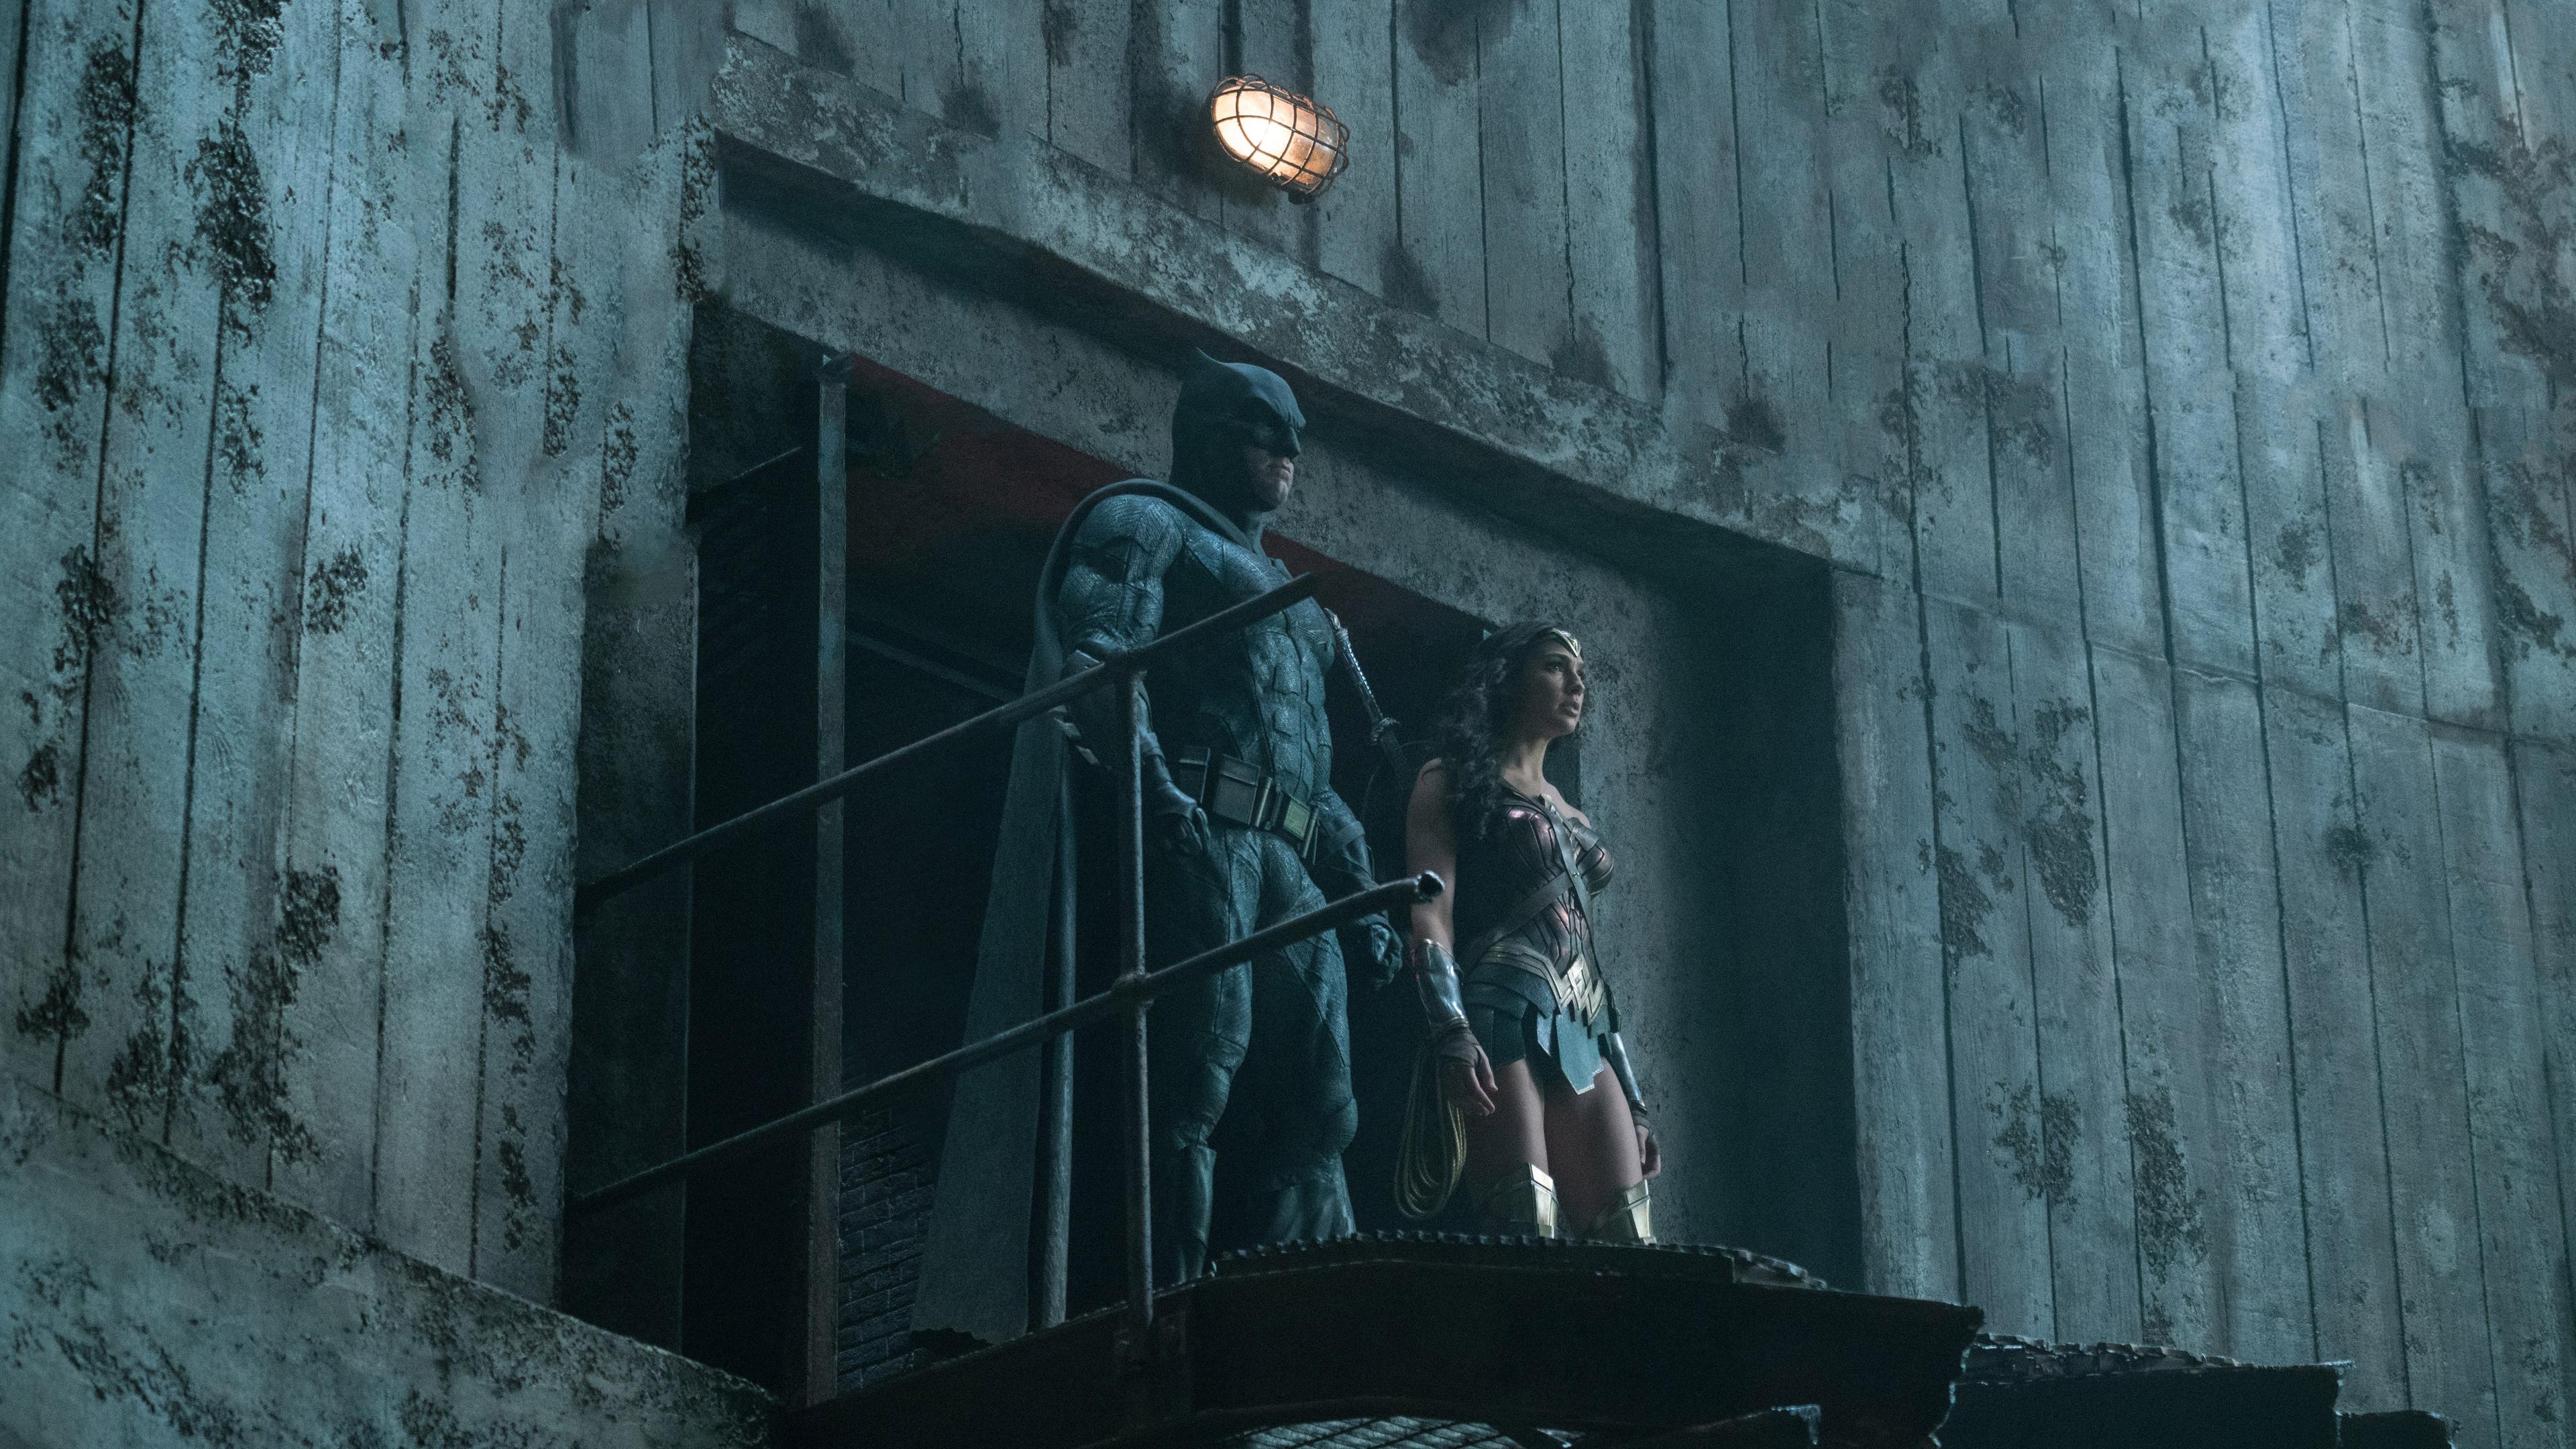 batman-wonder-woman-justice-league-2017-67.jpg